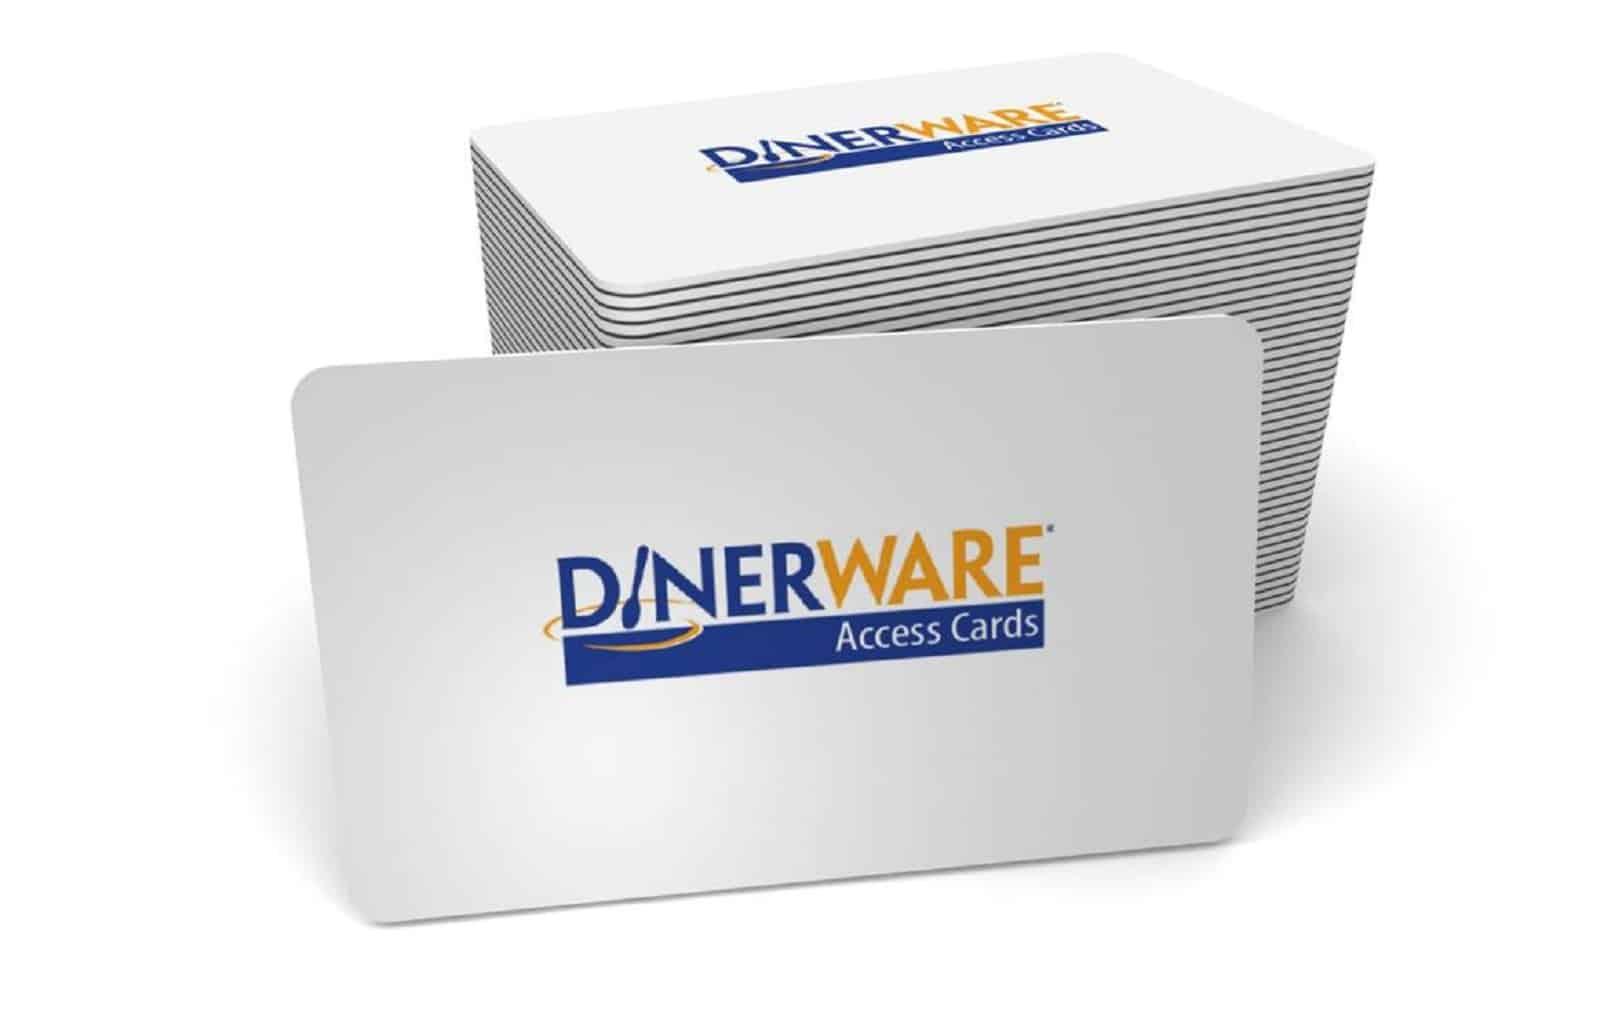 Dinerware POS Employee Swipe Cards | POS-Depot Custom Gift Cards Micros Hardware Sales + More  sc 1 st  POS Depot & Dinerware POS Employee Swipe Cards | POS-Depot Custom Gift Cards ...